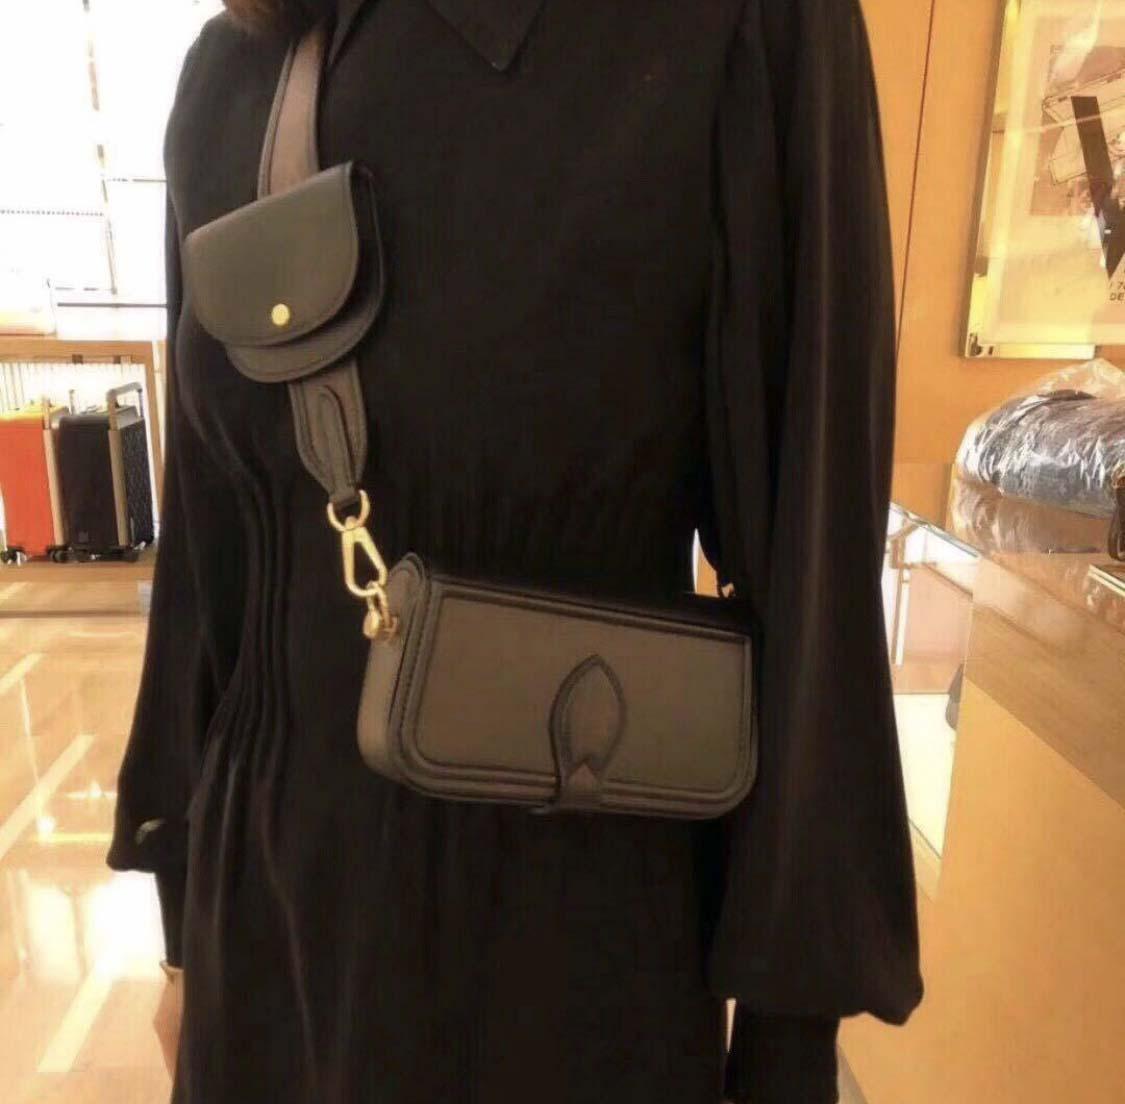 Nova Qualidade Moda Moda Saco De Saco De Desenhista Sacos Mulheres Cross Body Ombro Bag Carteira Crossbody Shell Bags Bolsas Moda Messenger Bag Bolsas